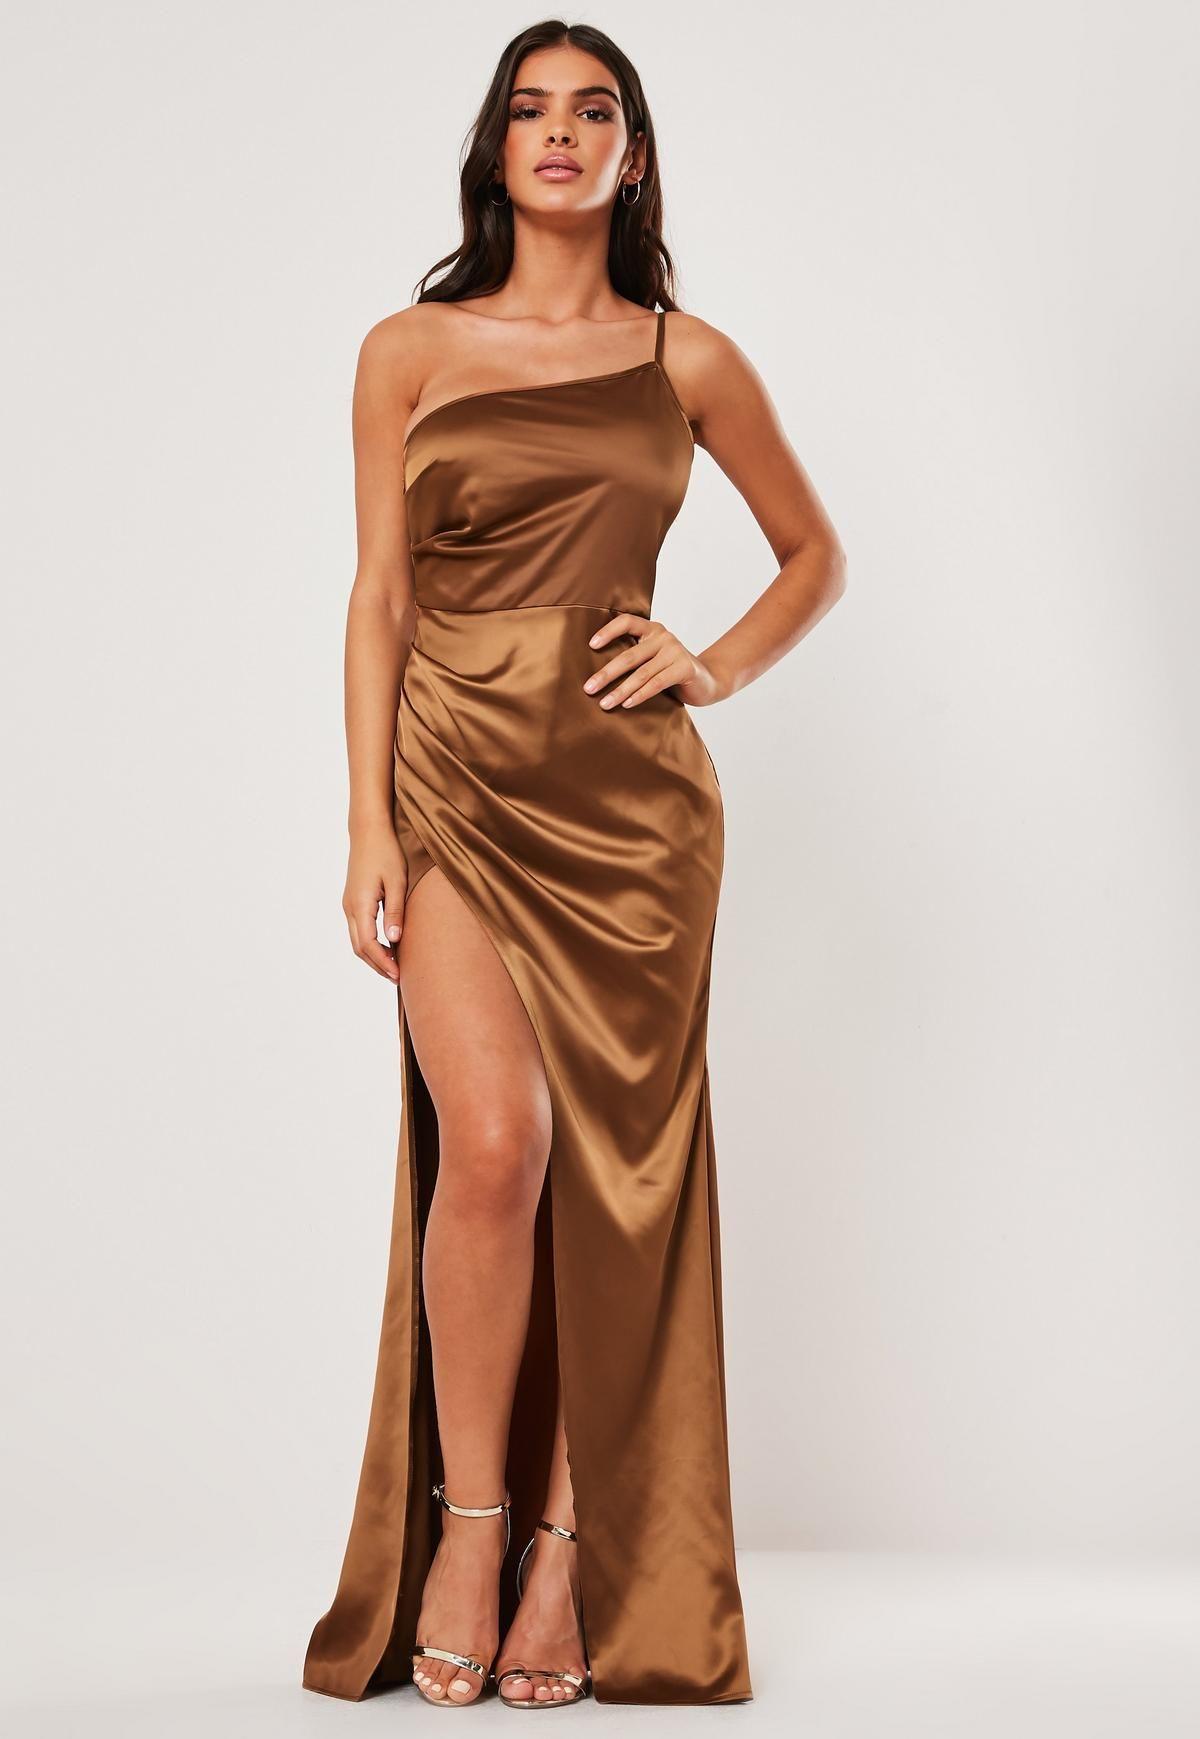 Tan Satin One Shoulder Maxi Dress Missguided Maxi Dress Drape Maxi Dress Trending Dresses [ 1739 x 1200 Pixel ]